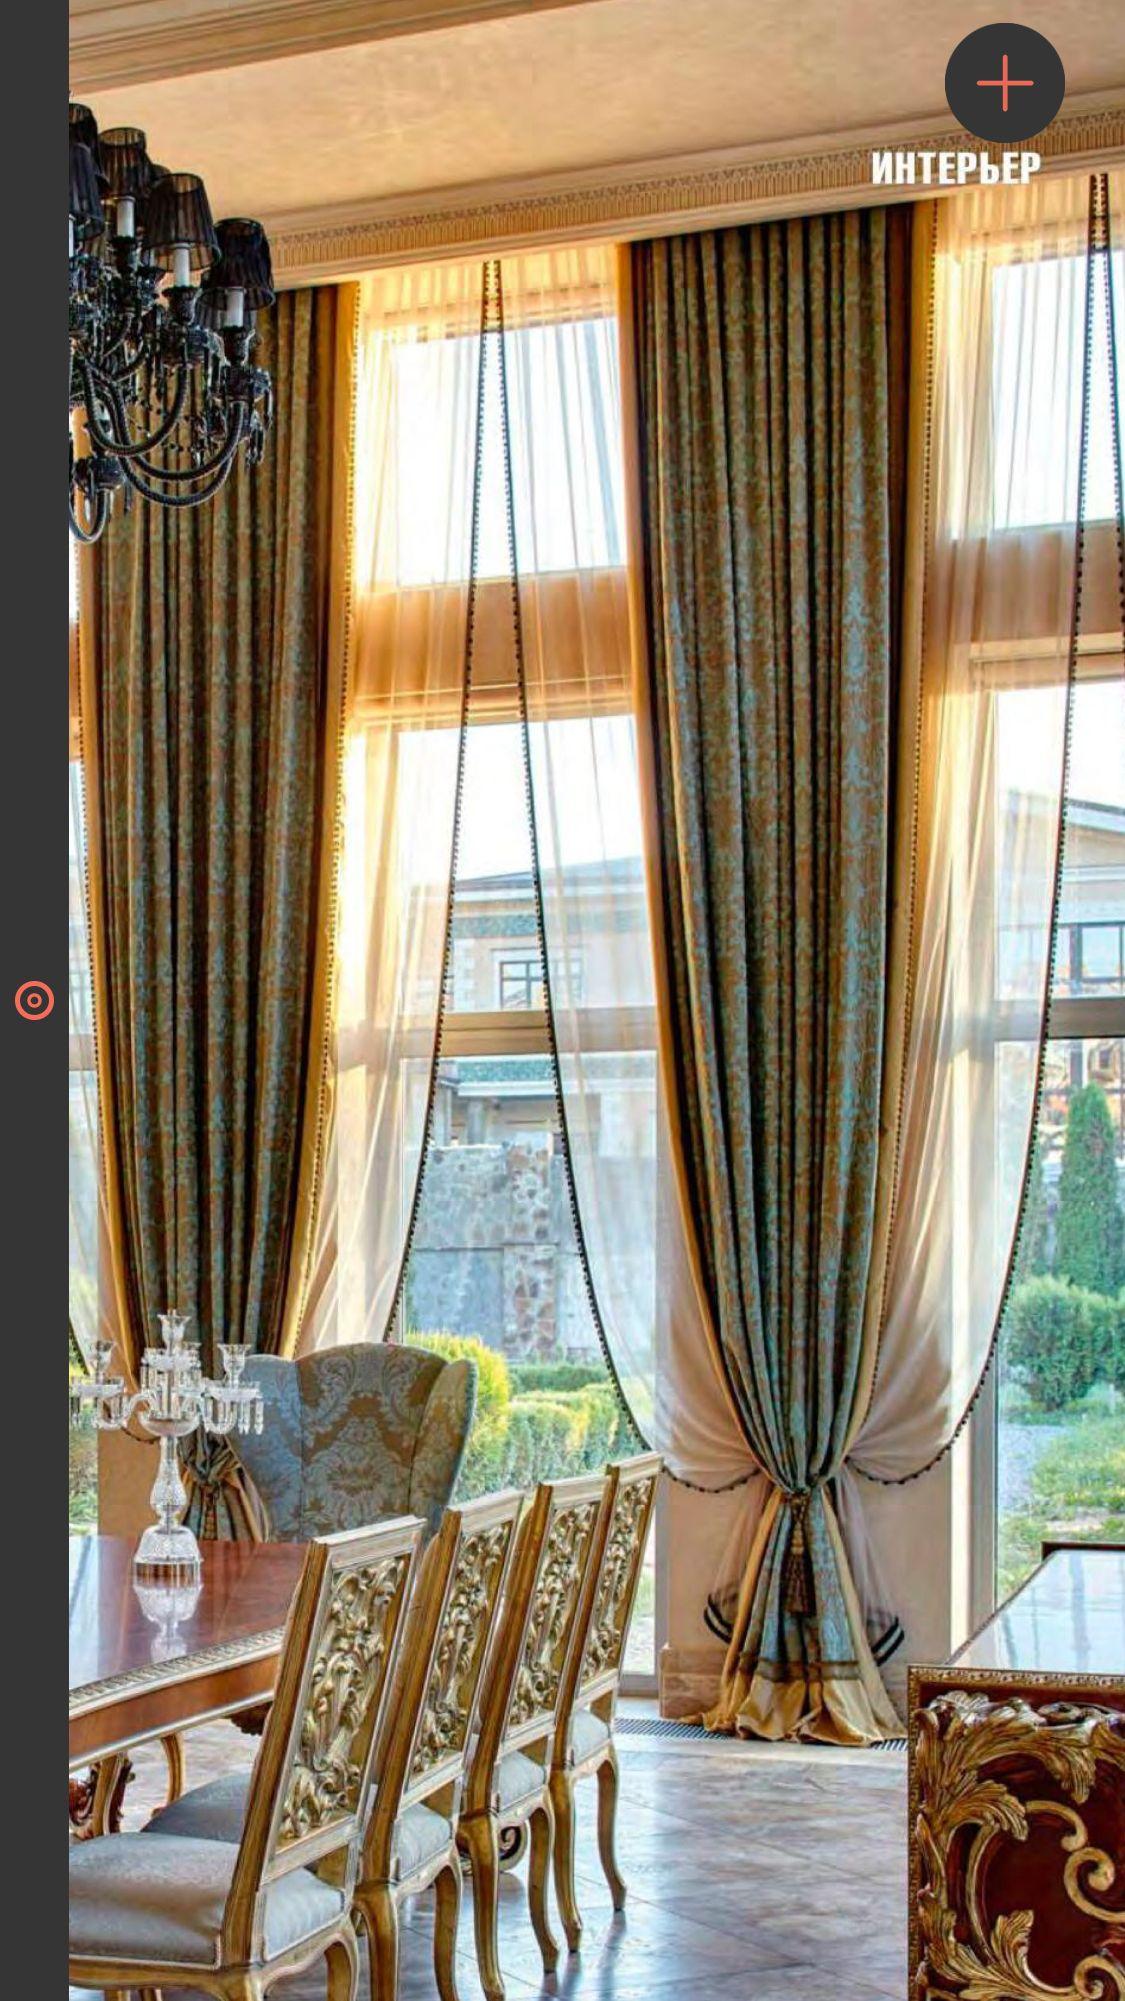 Barocco Textiles And Interiors Living Room Decor Curtains Room Decor Decor